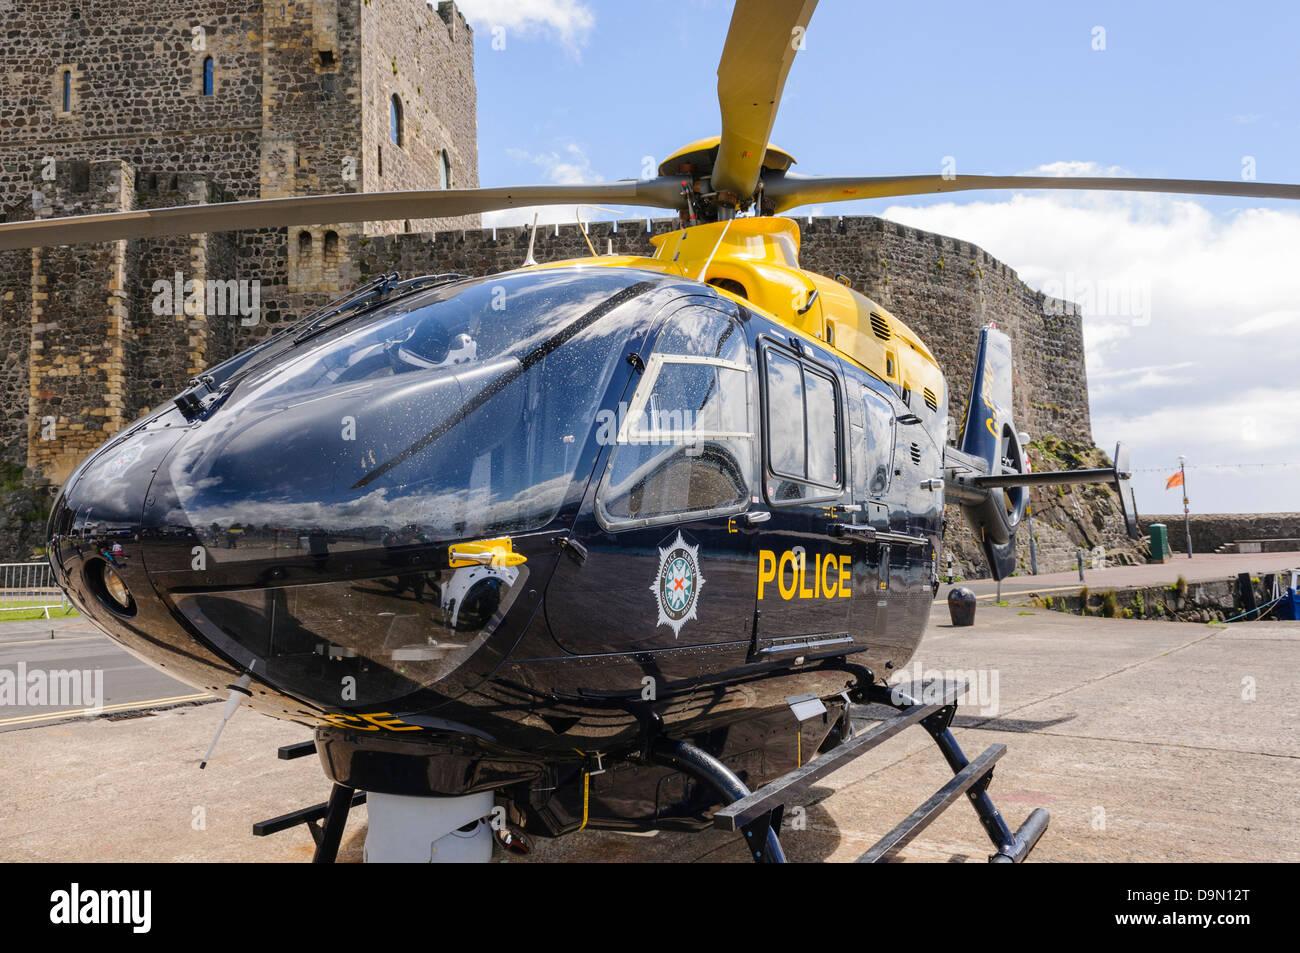 PSNI Police Helicopter Eurocopter EC135 GPSNI On The Ground Stock Photo Ro